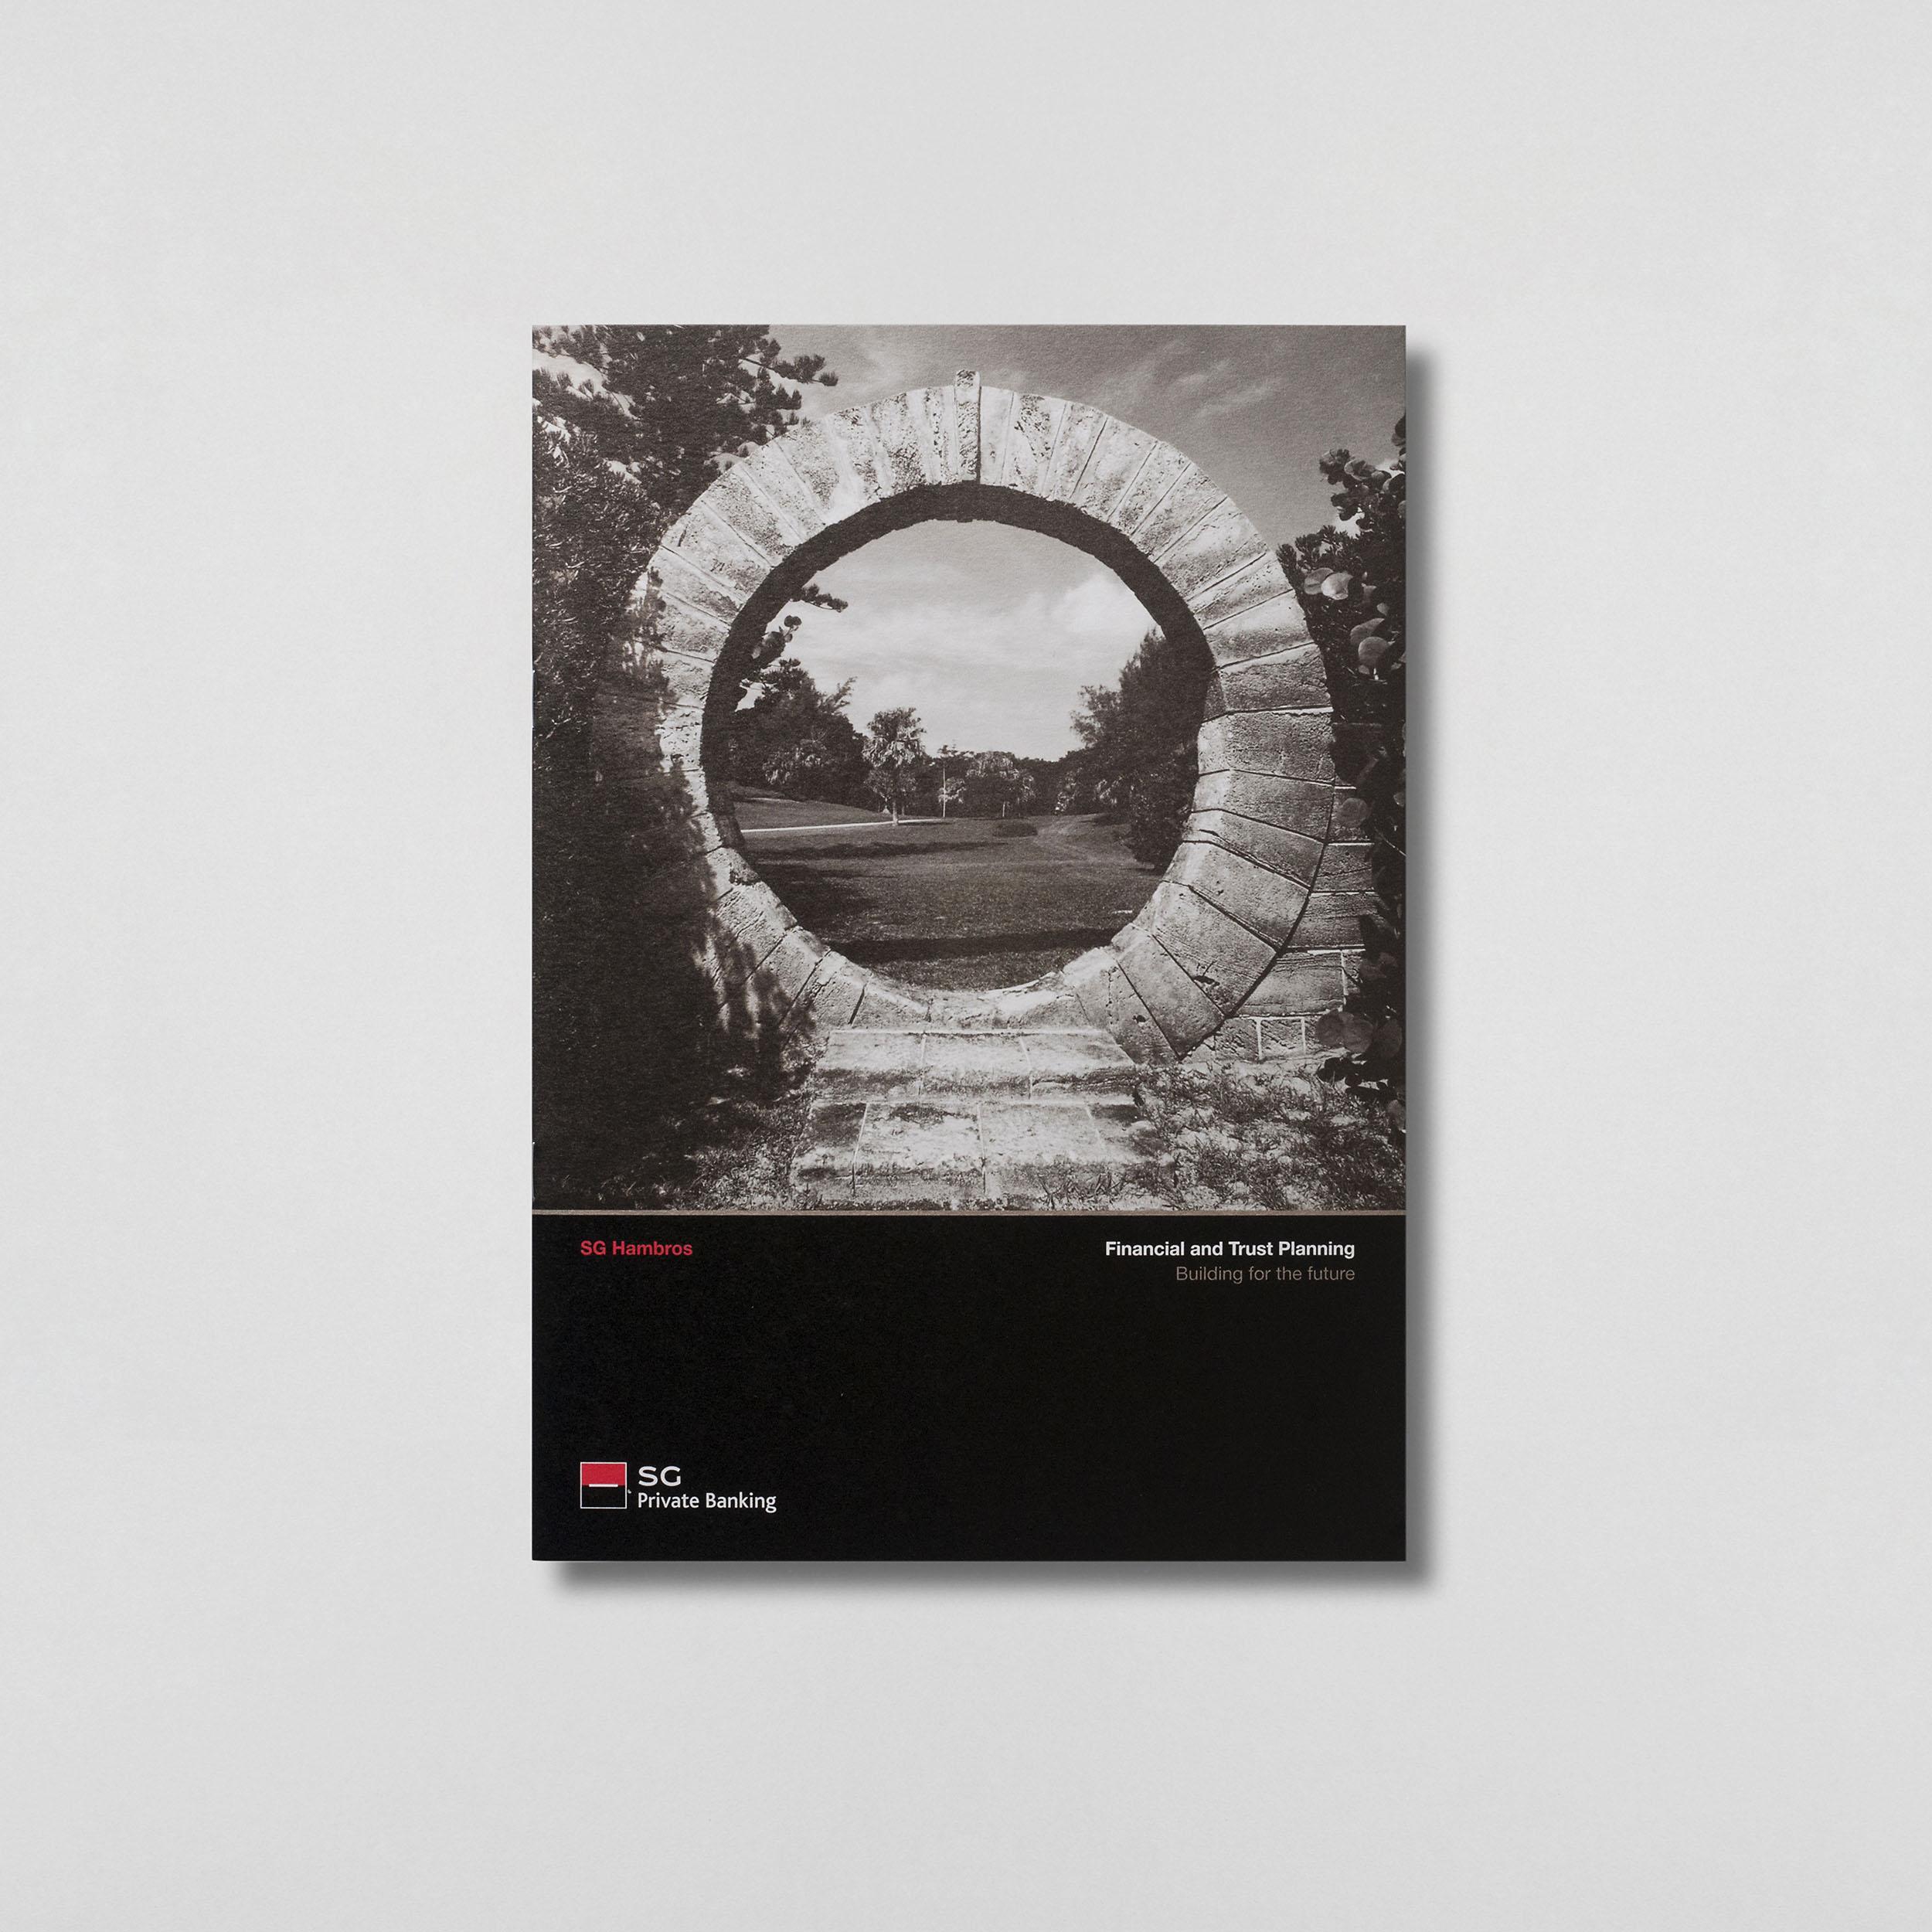 SGH.FT.Cover.Sq.jpg